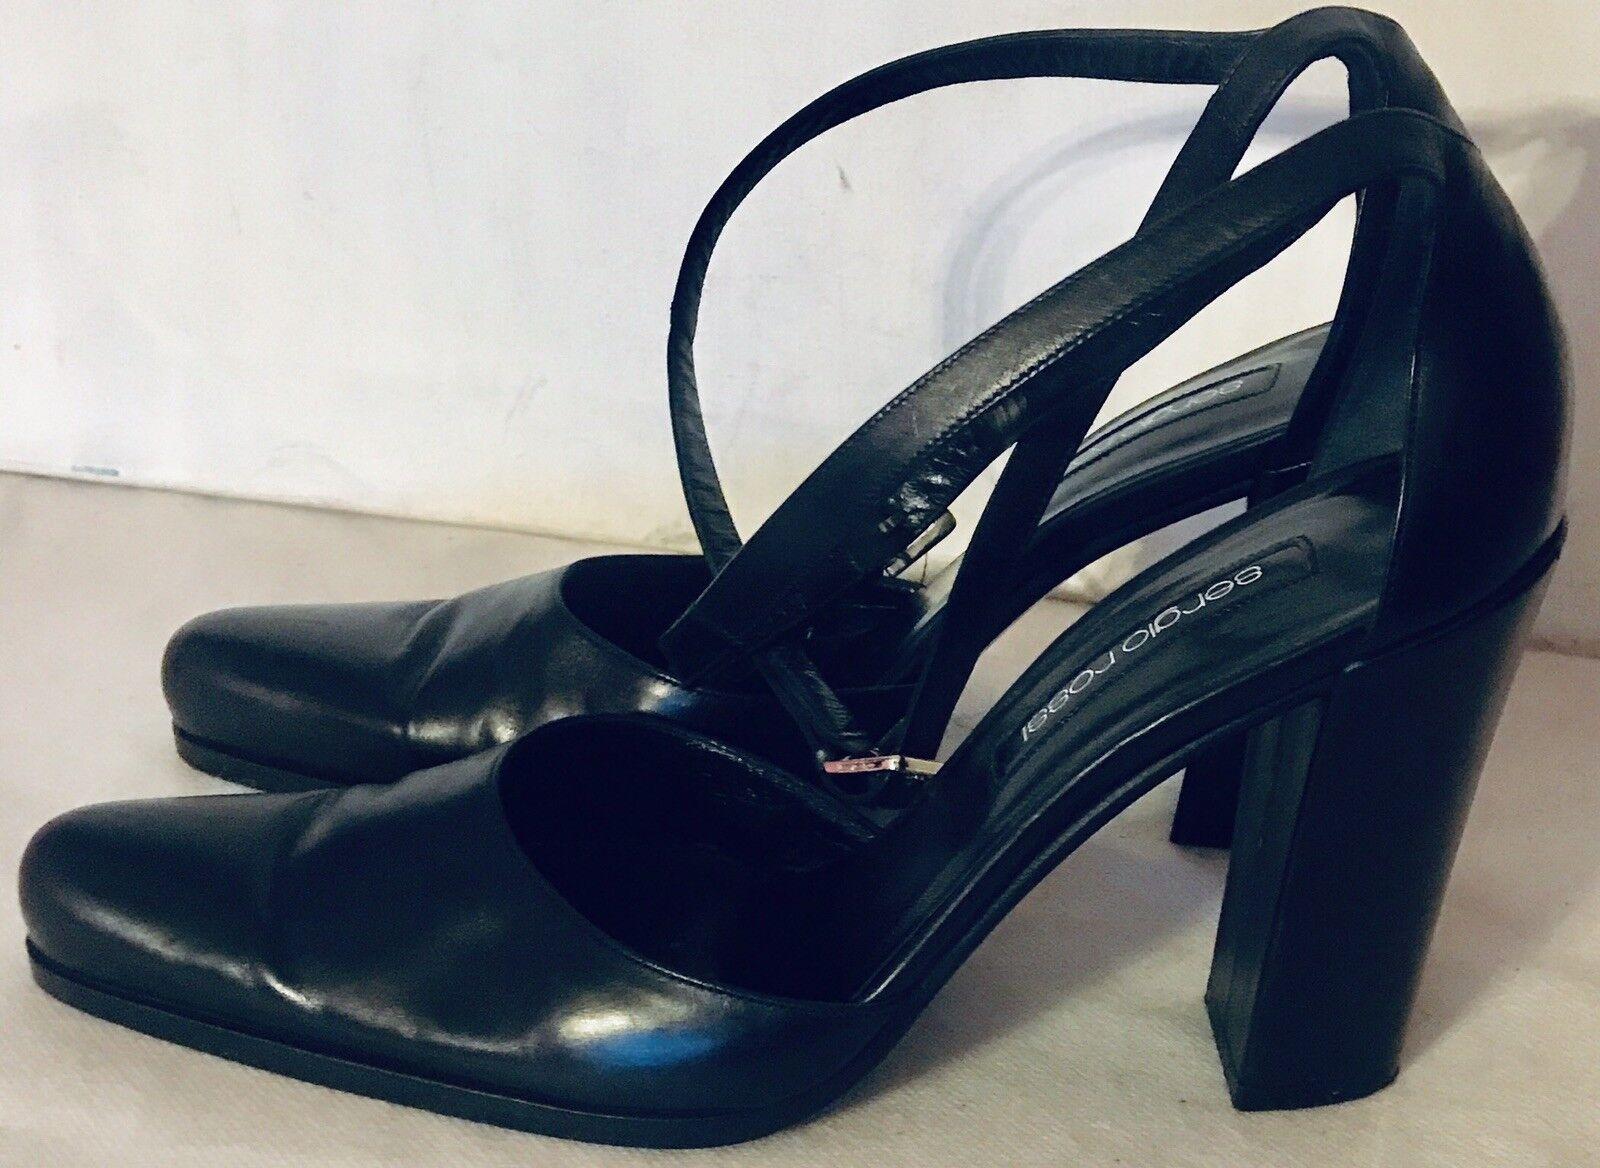 Sergio Rossi Women's Black Leather Block Block Block Heels D'Orsays Size 10 M 41 EUC 5ced0b